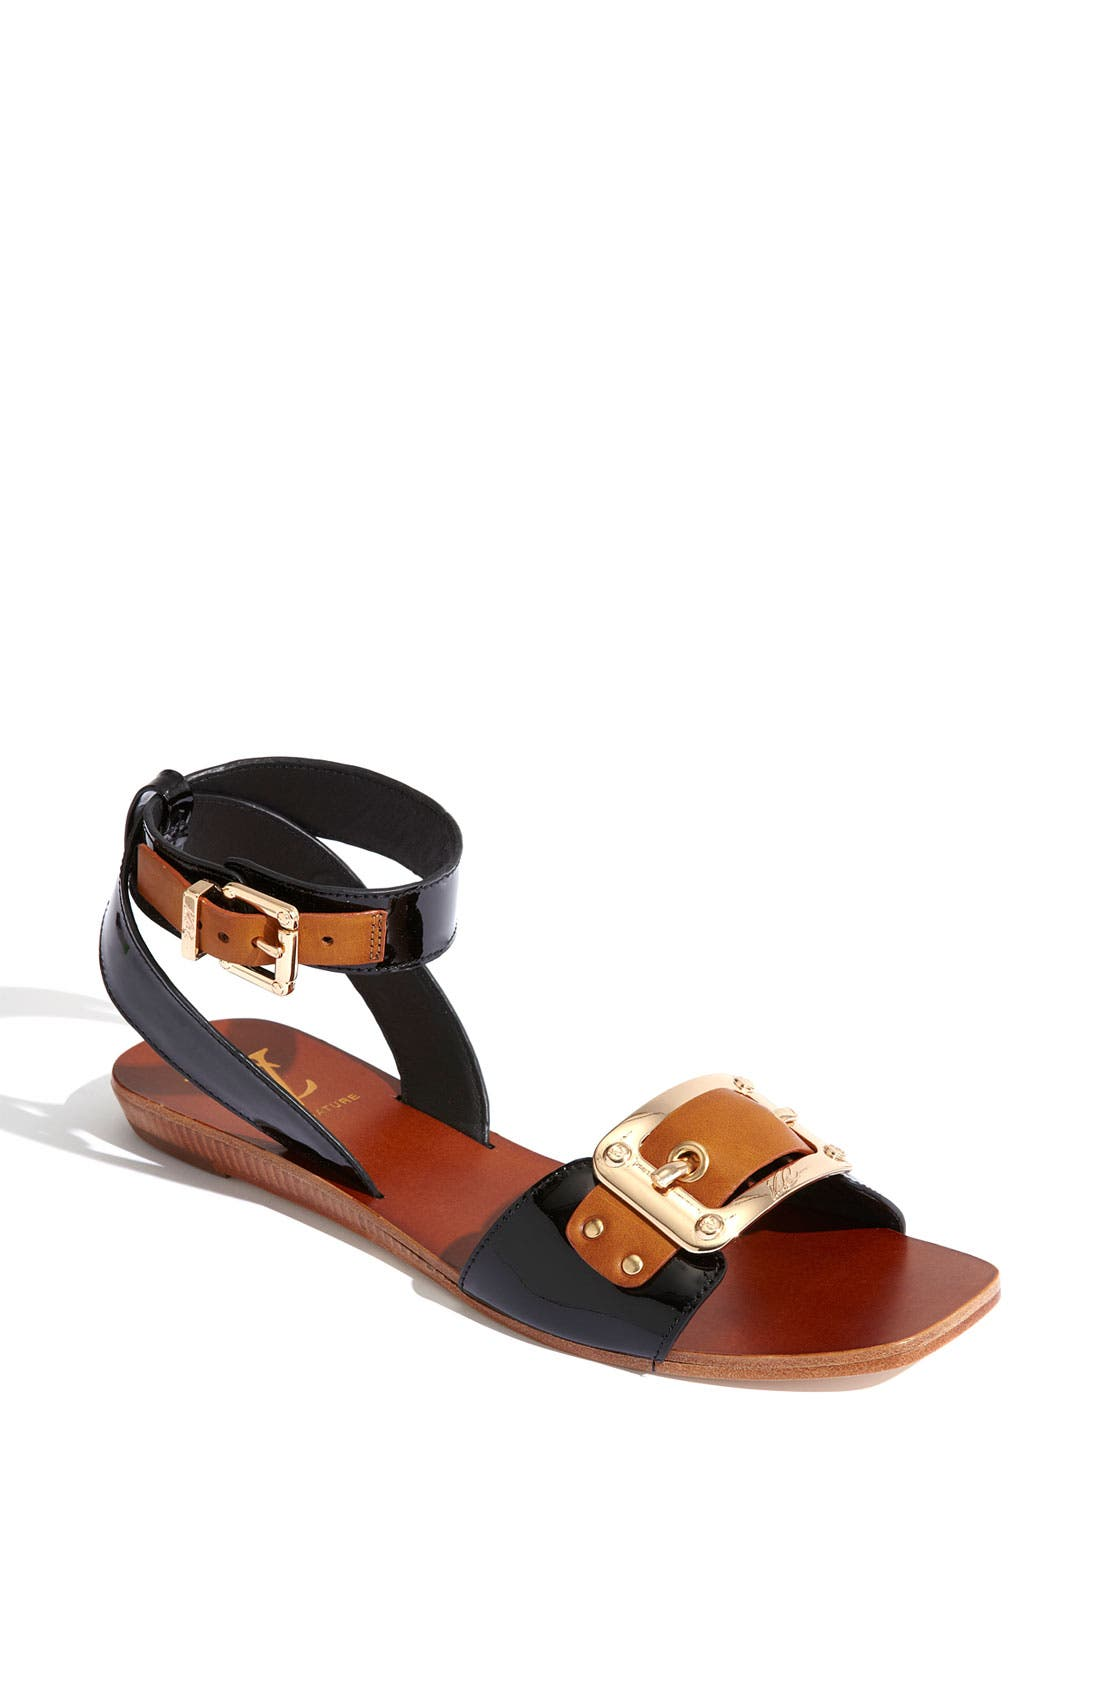 Alternate Image 1 Selected - VC Signature 'Florence' Sandal